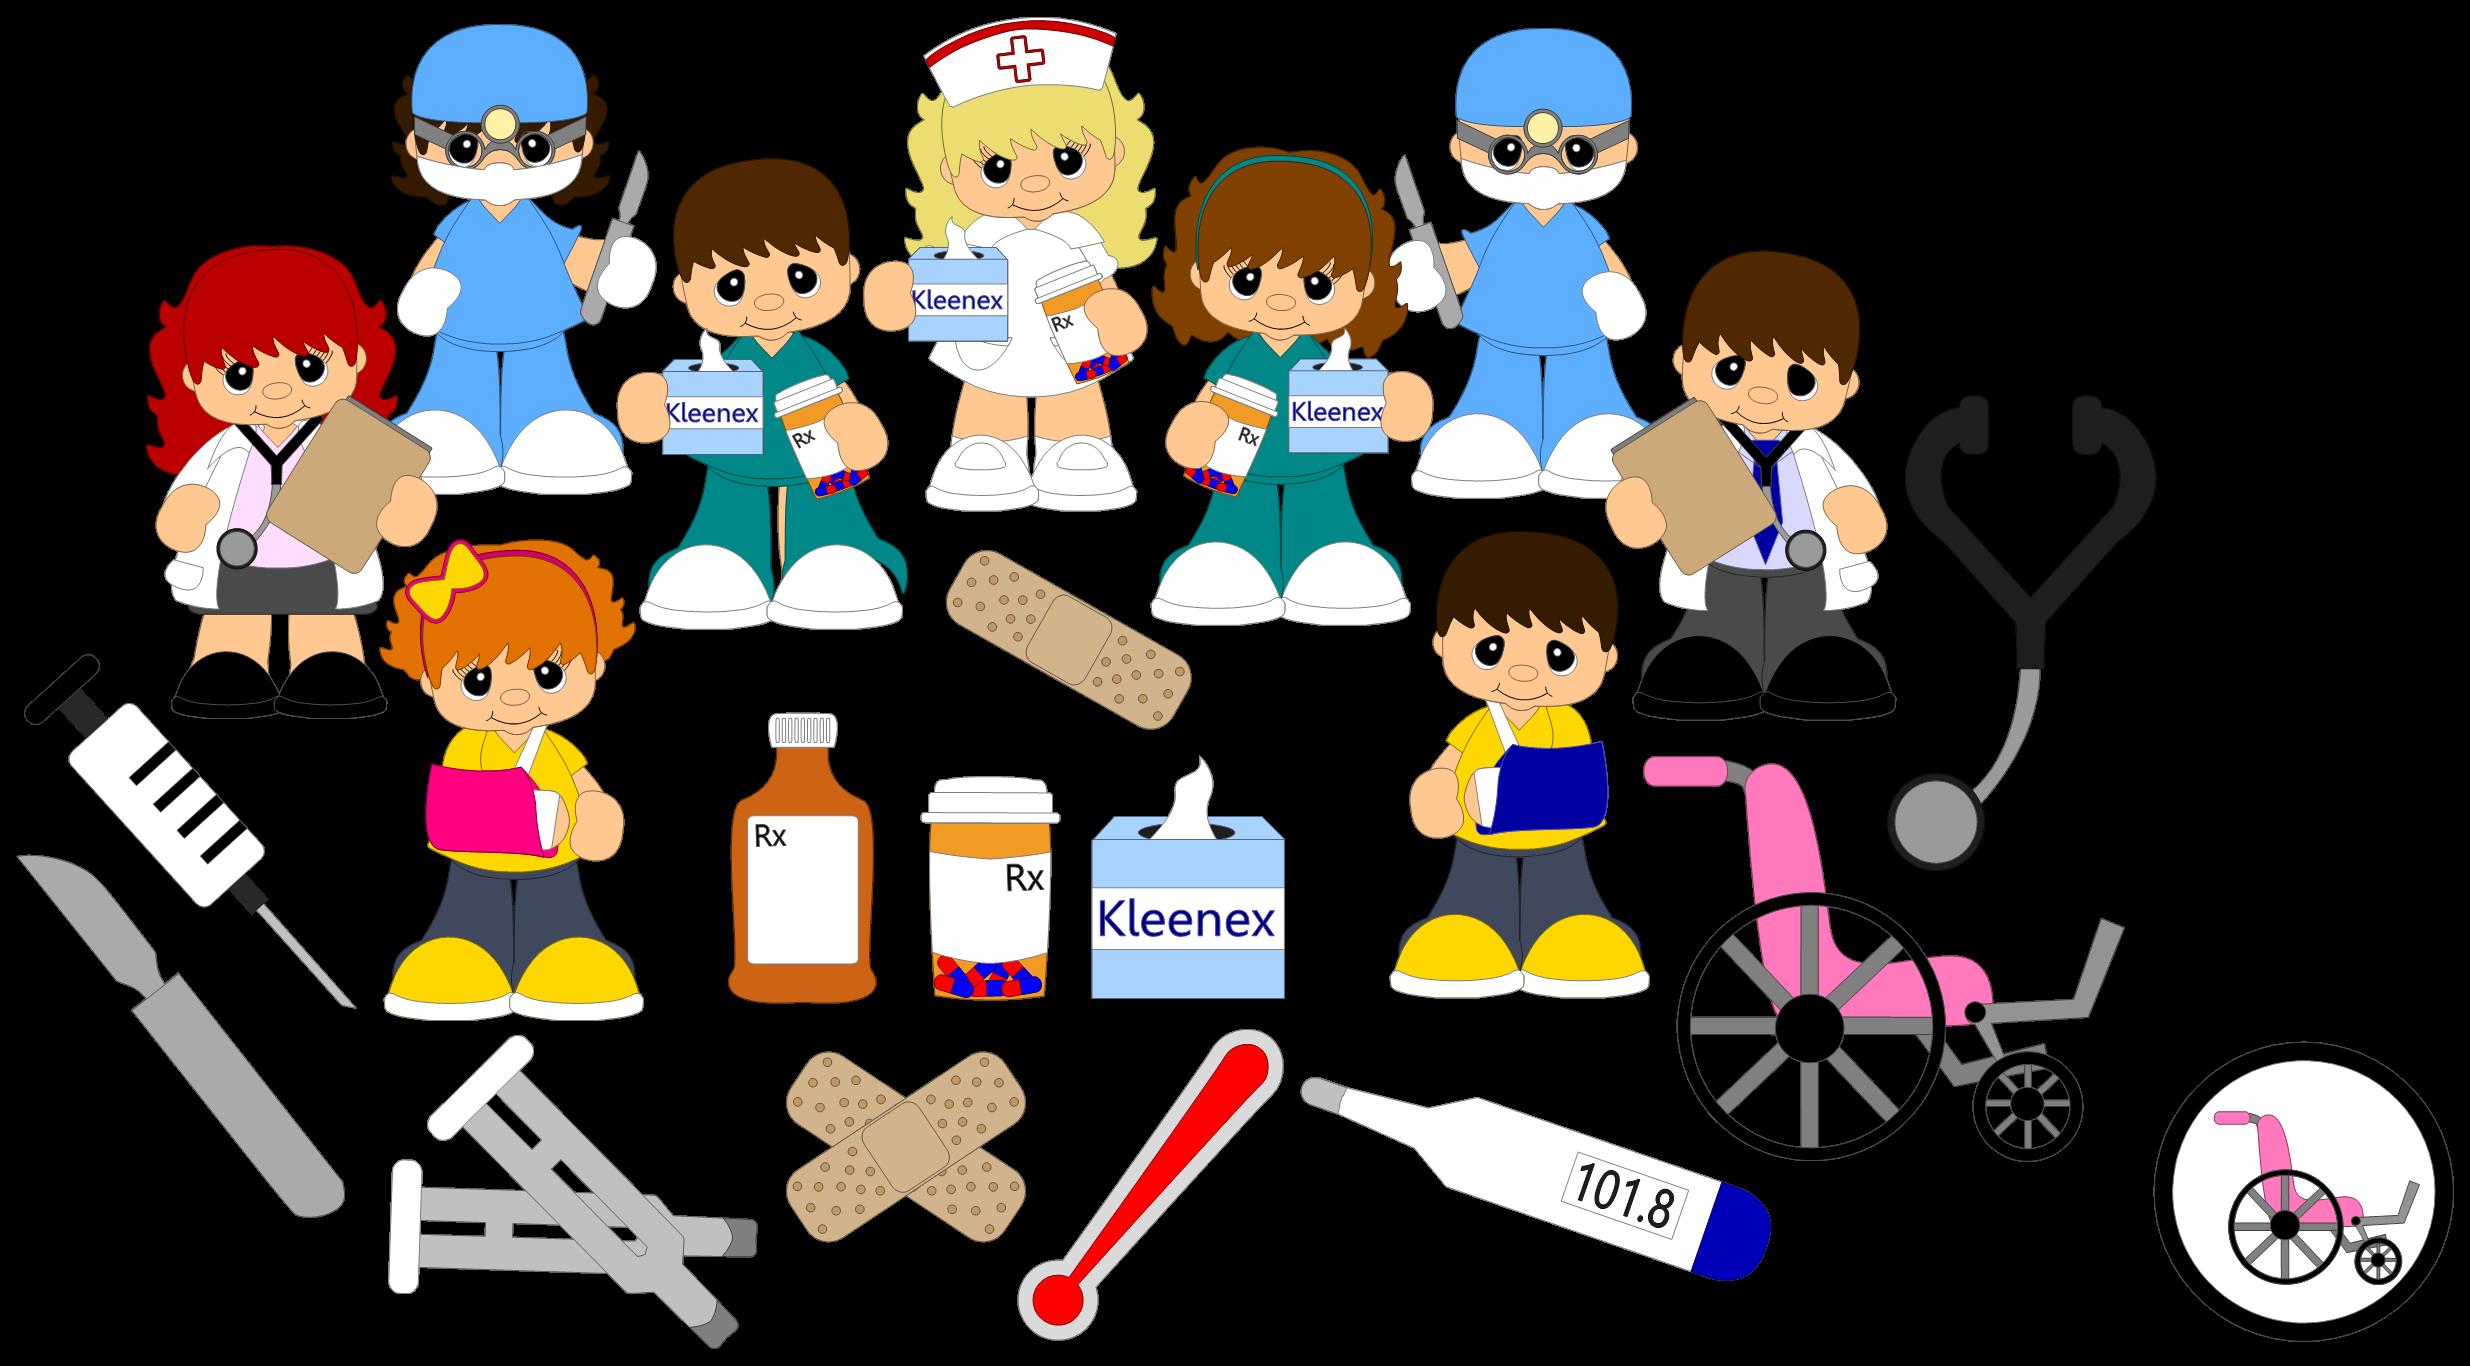 Team. Emergency clipart medical logo